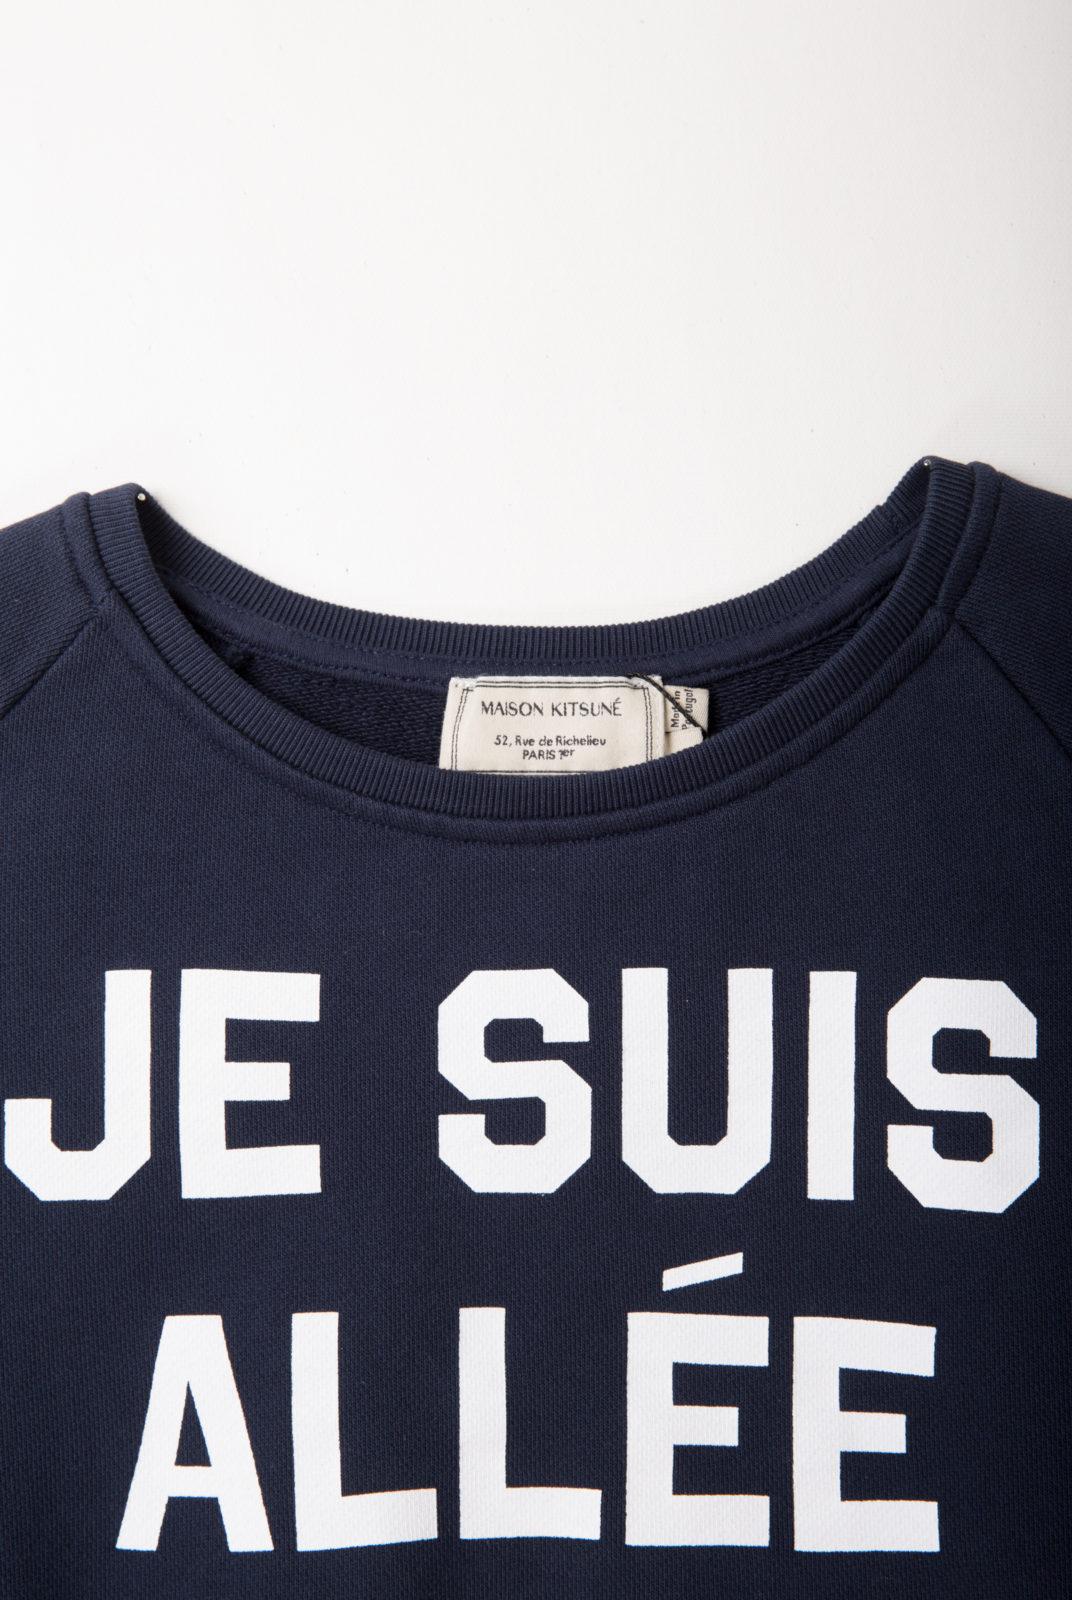 sweat, navy, inscription, coton, encolure ronde, kitsune